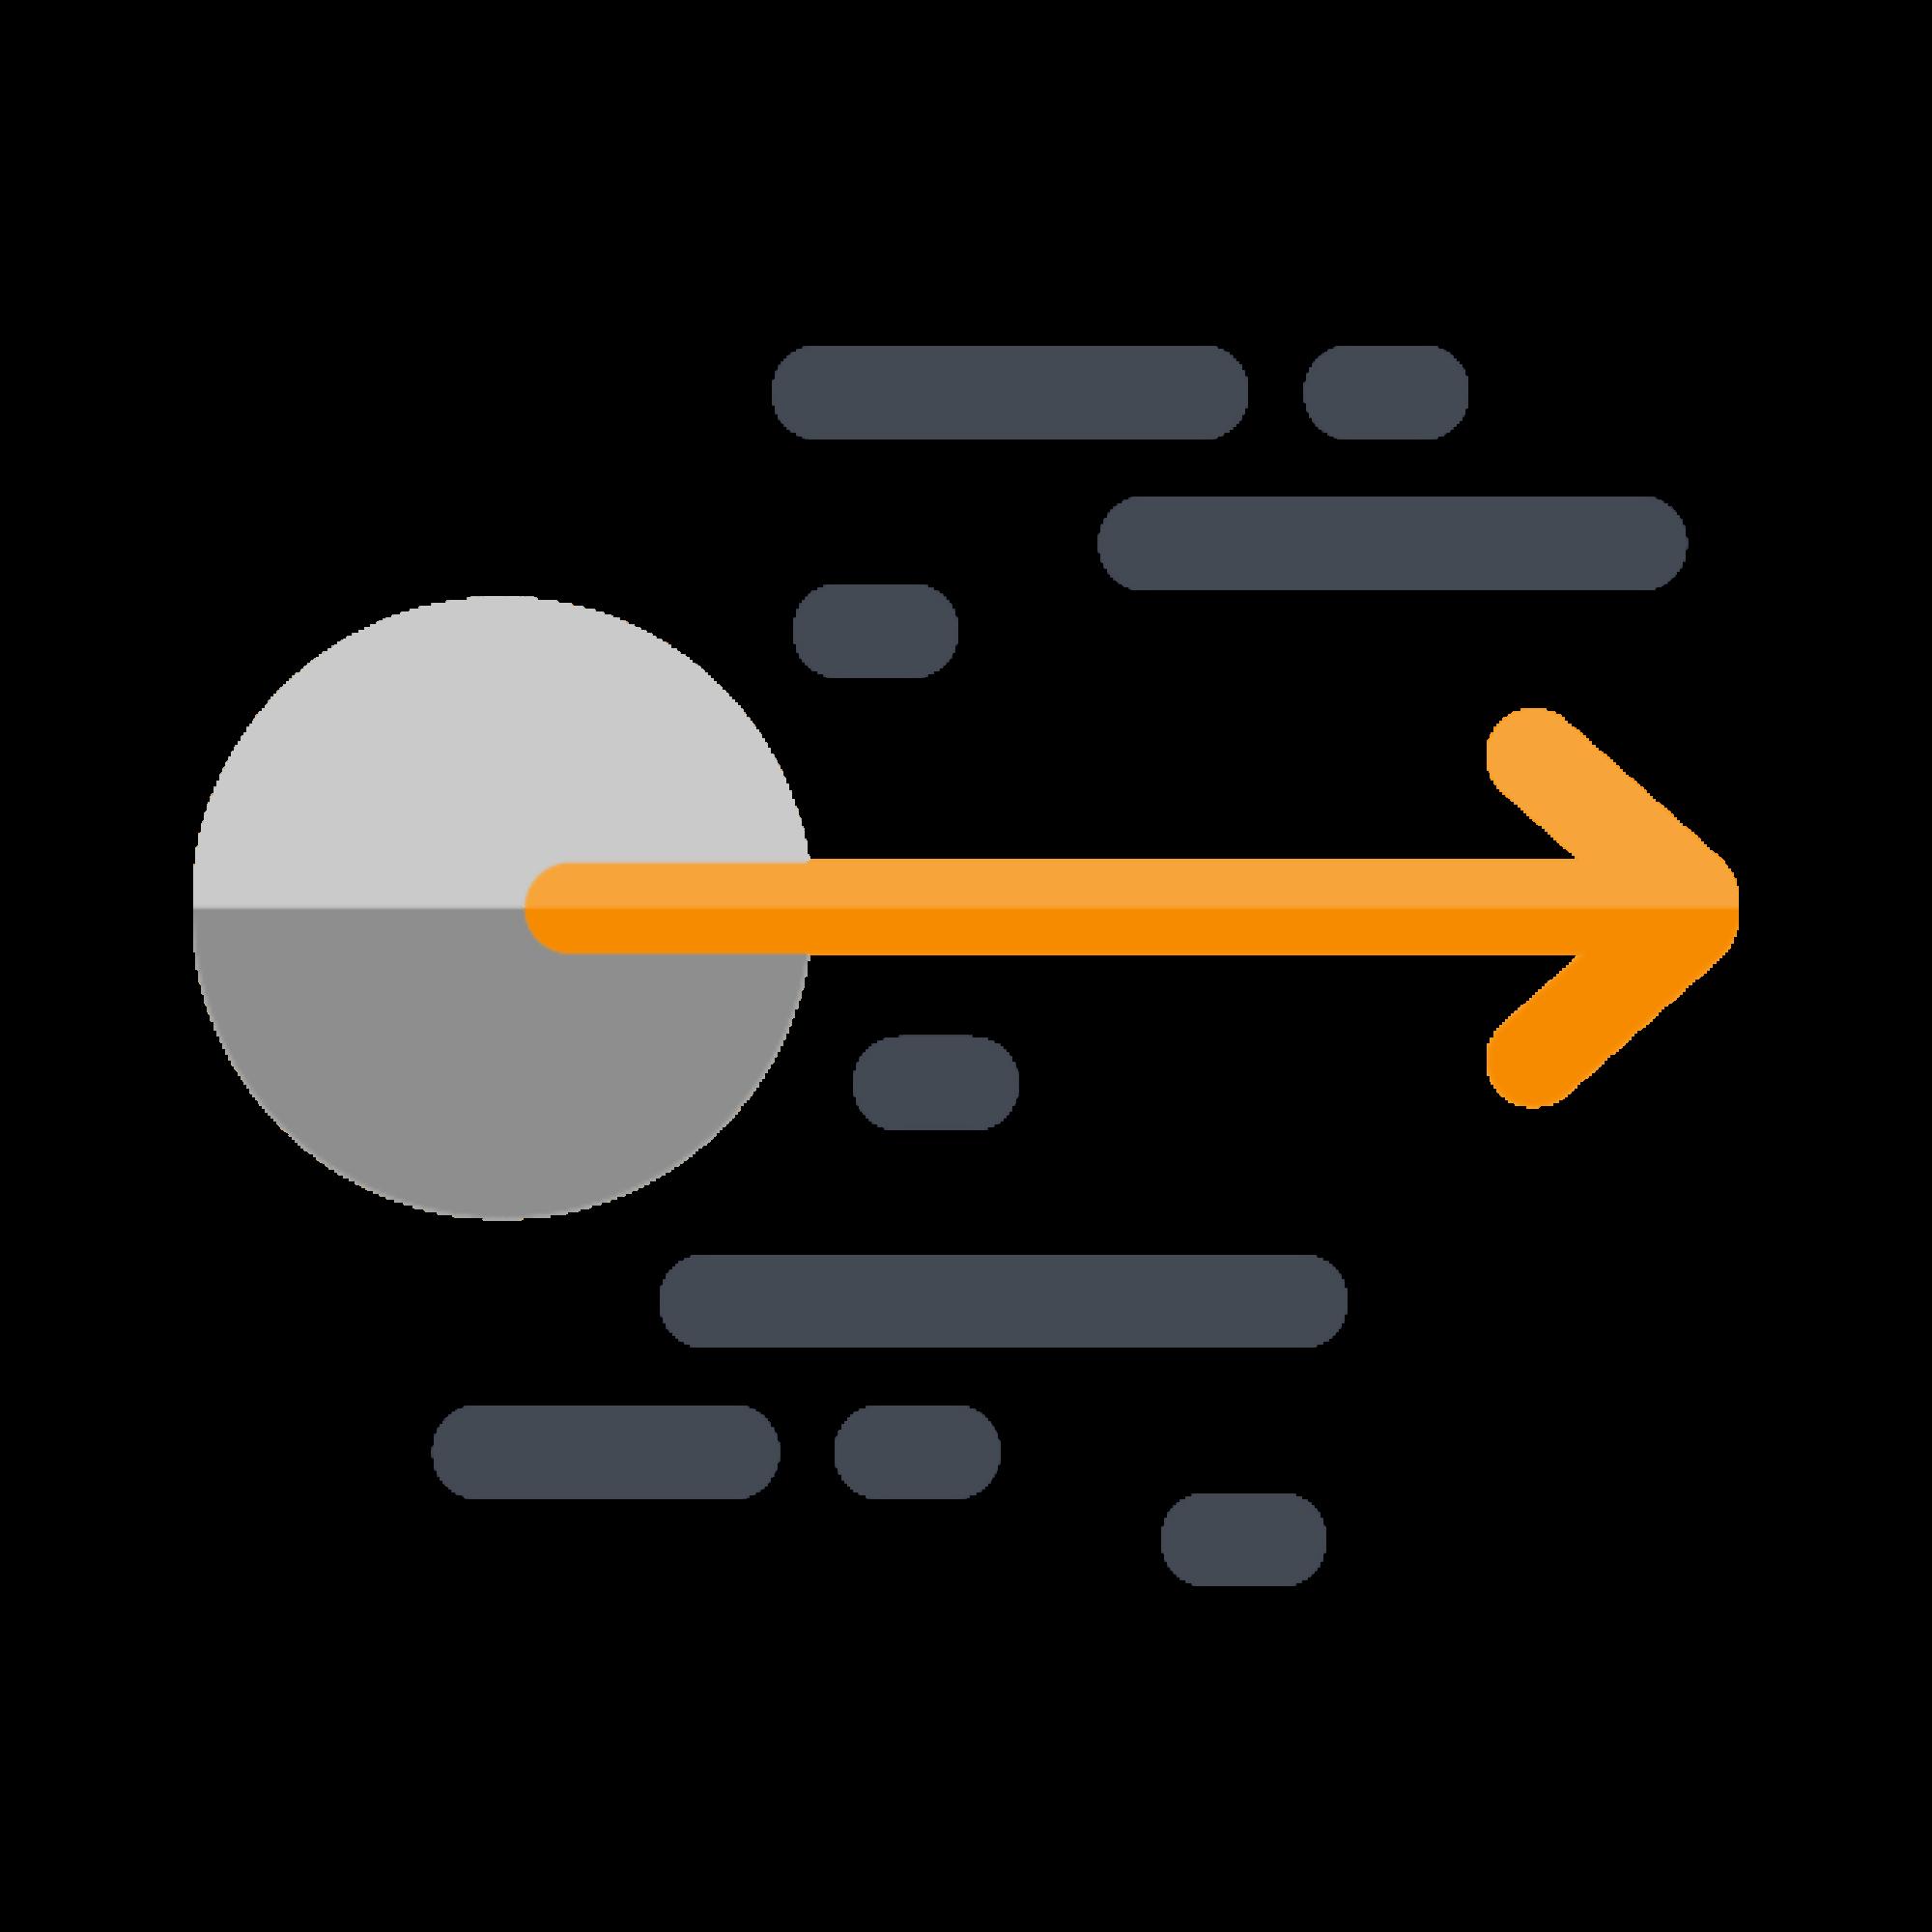 Right pointing arrow illustration